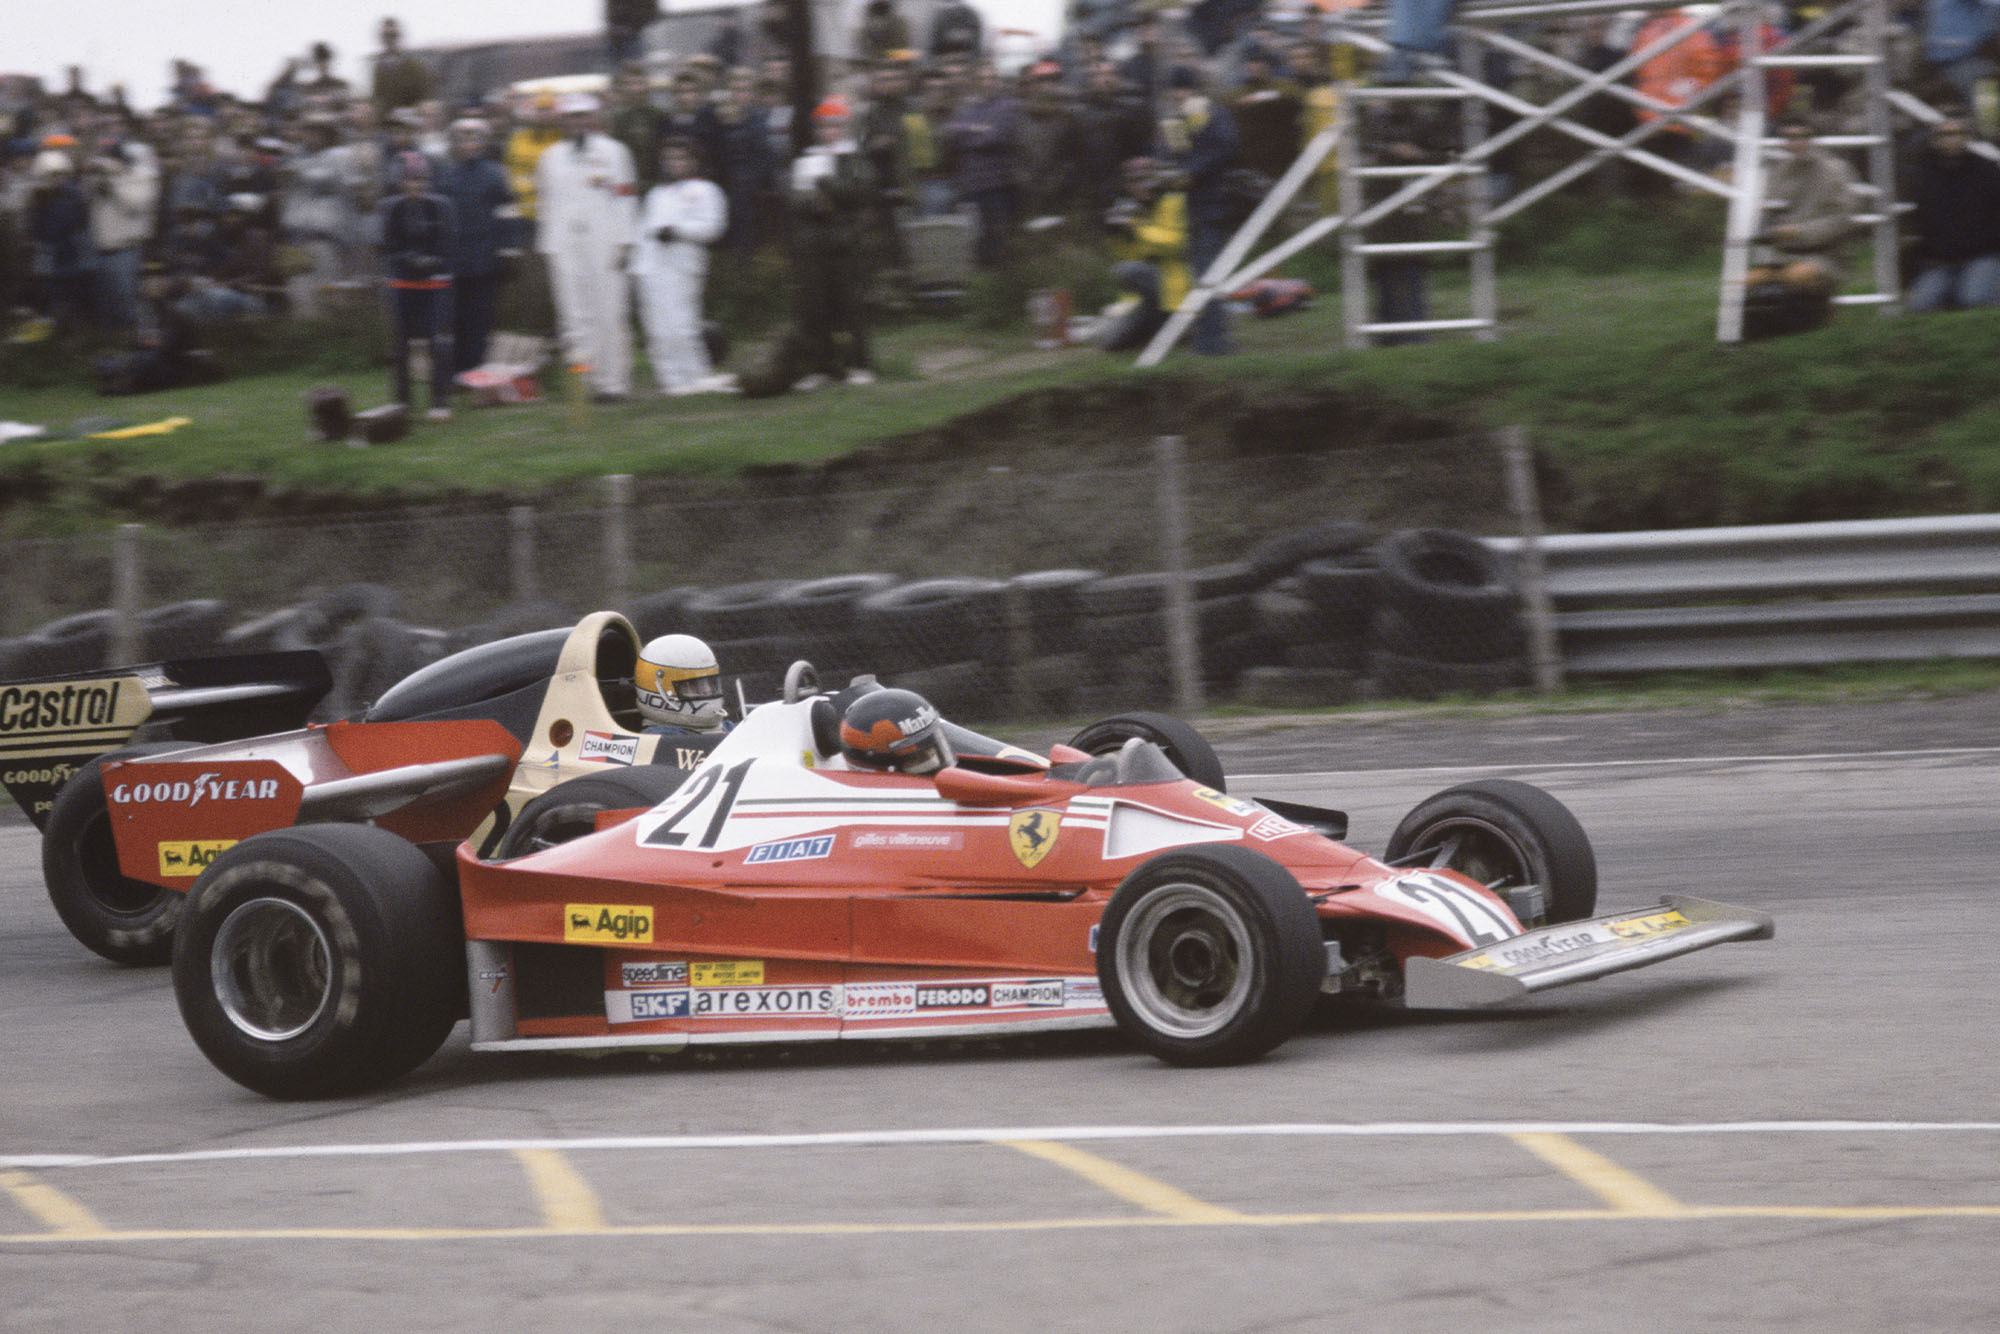 Gilles Villeneuve (Ferrari) fights with Jody Scheckter (Wolf), 1977 Canadian Grand Prix, Mosport Park.